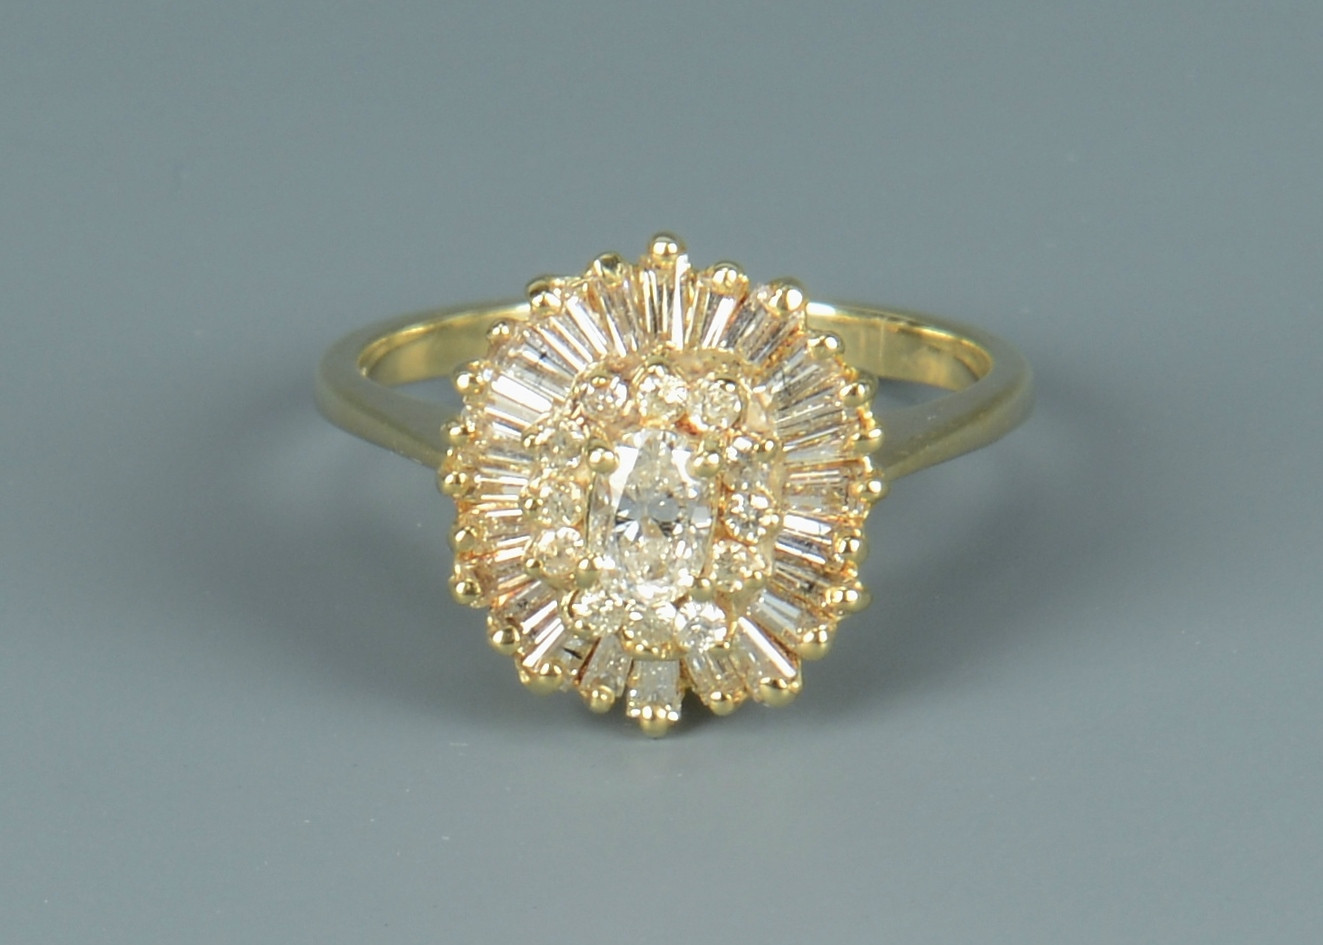 Lot 676: Ladies 14k Diamond Cocktail Ring